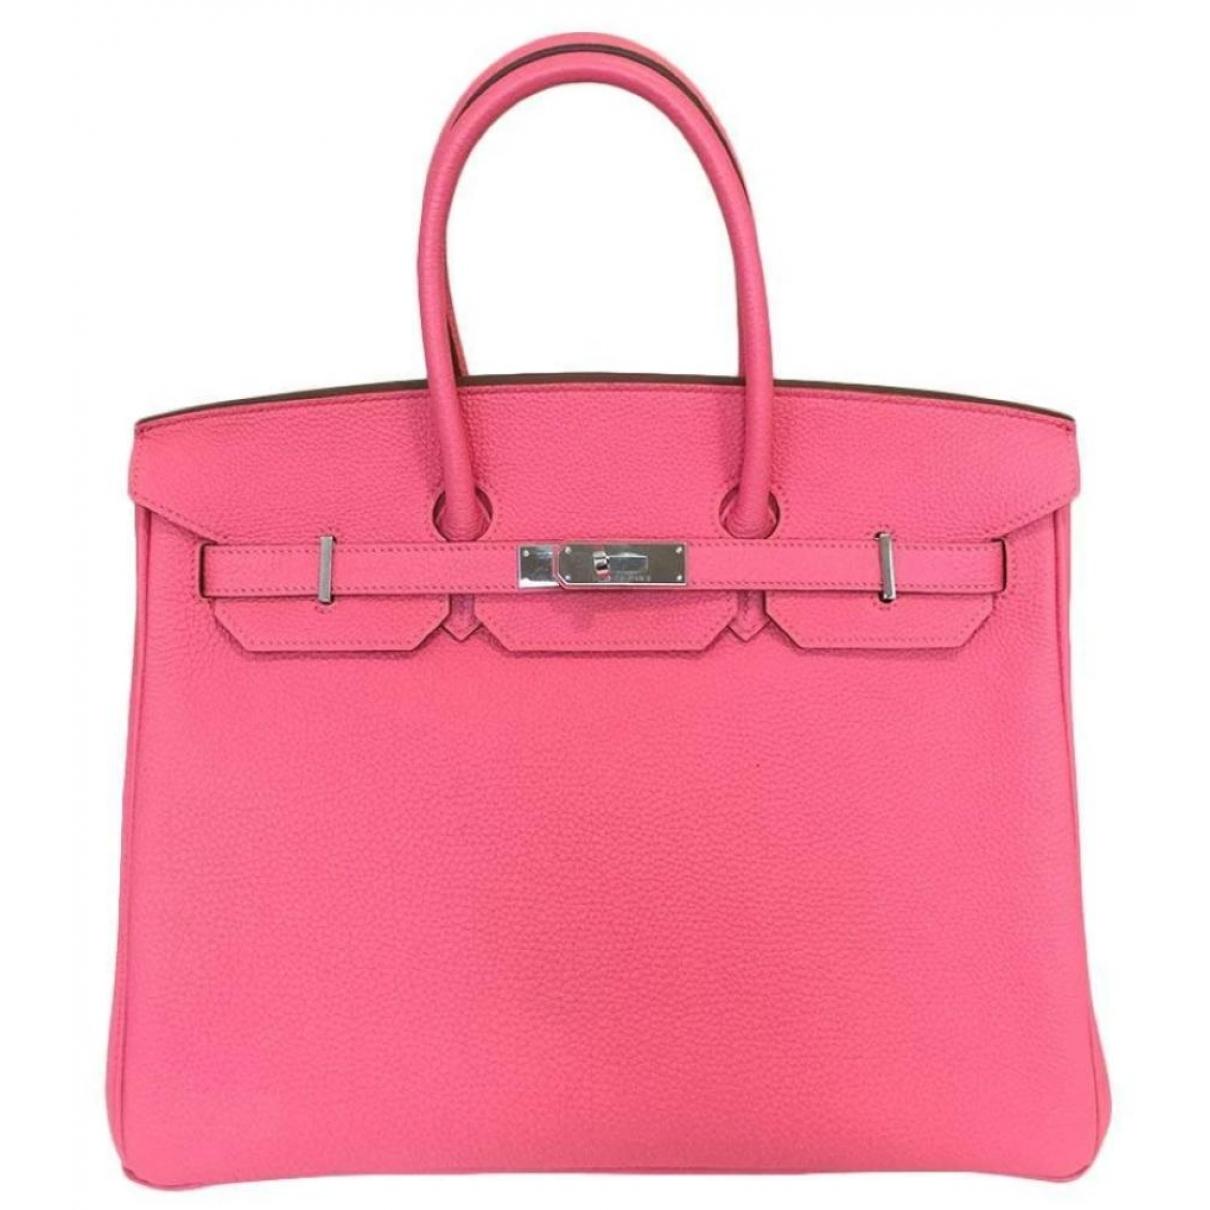 Hermès Birkin 35 Pink Leather handbag for Women \N